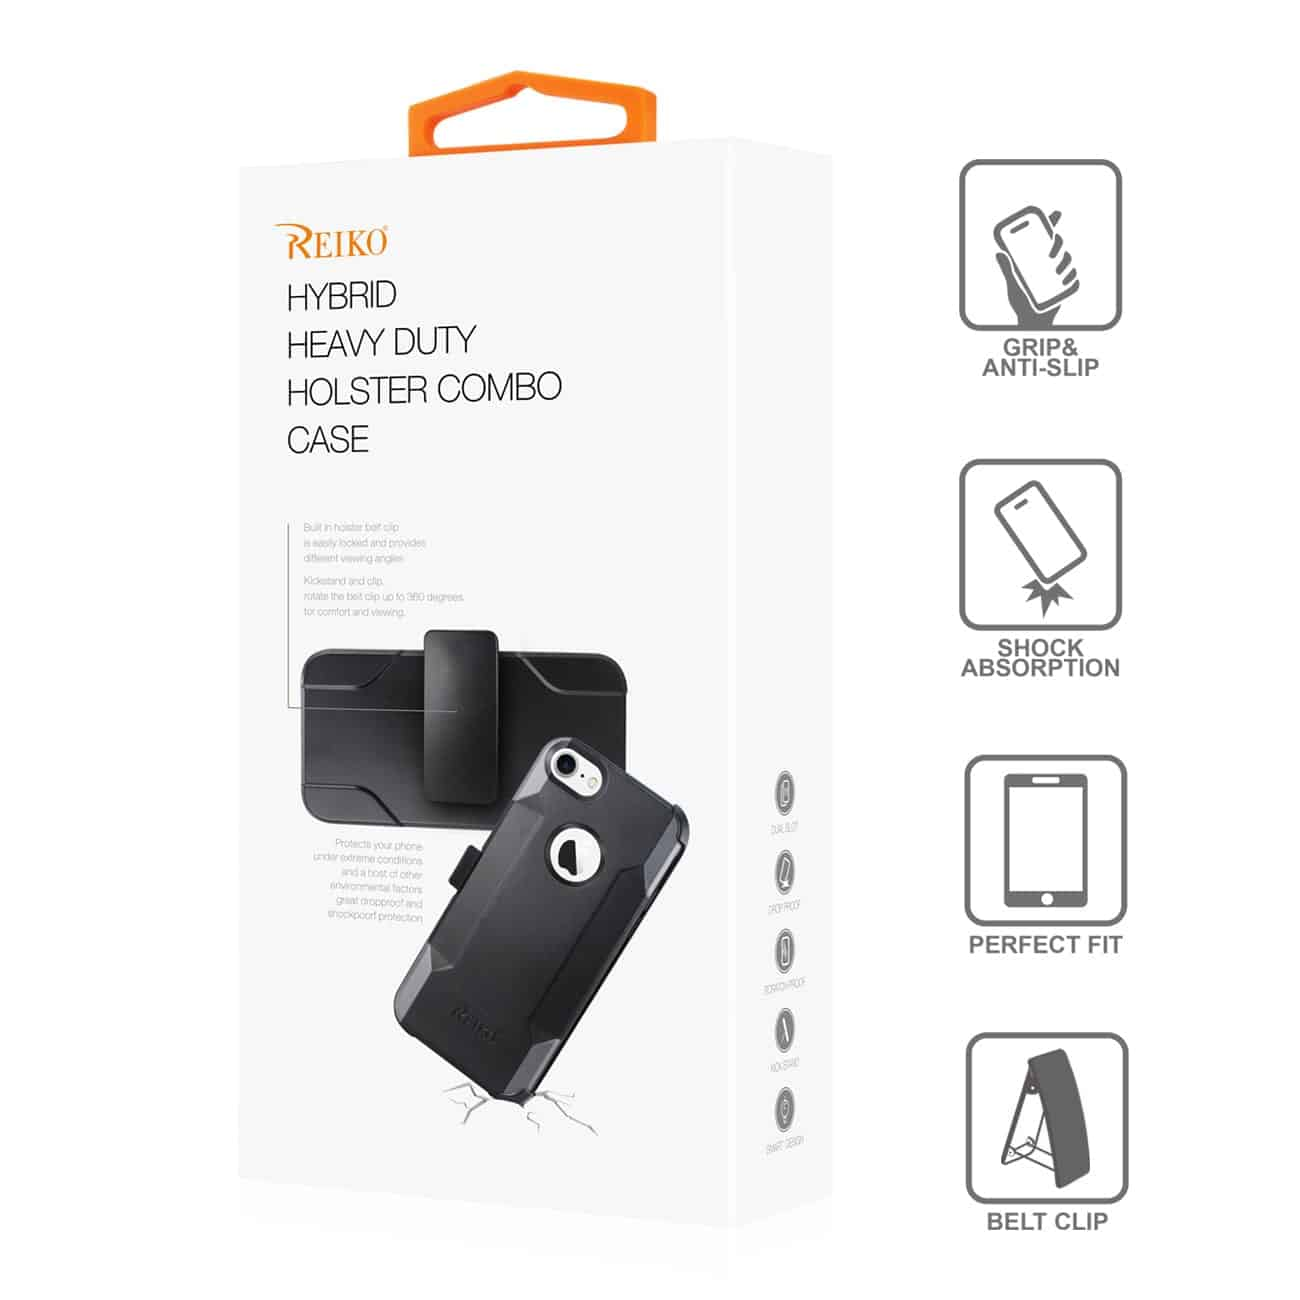 IPHONE 8 3-IN-1 HYBRID HEAVY DUTY HOLSTER COMBO CASE IN NAVY